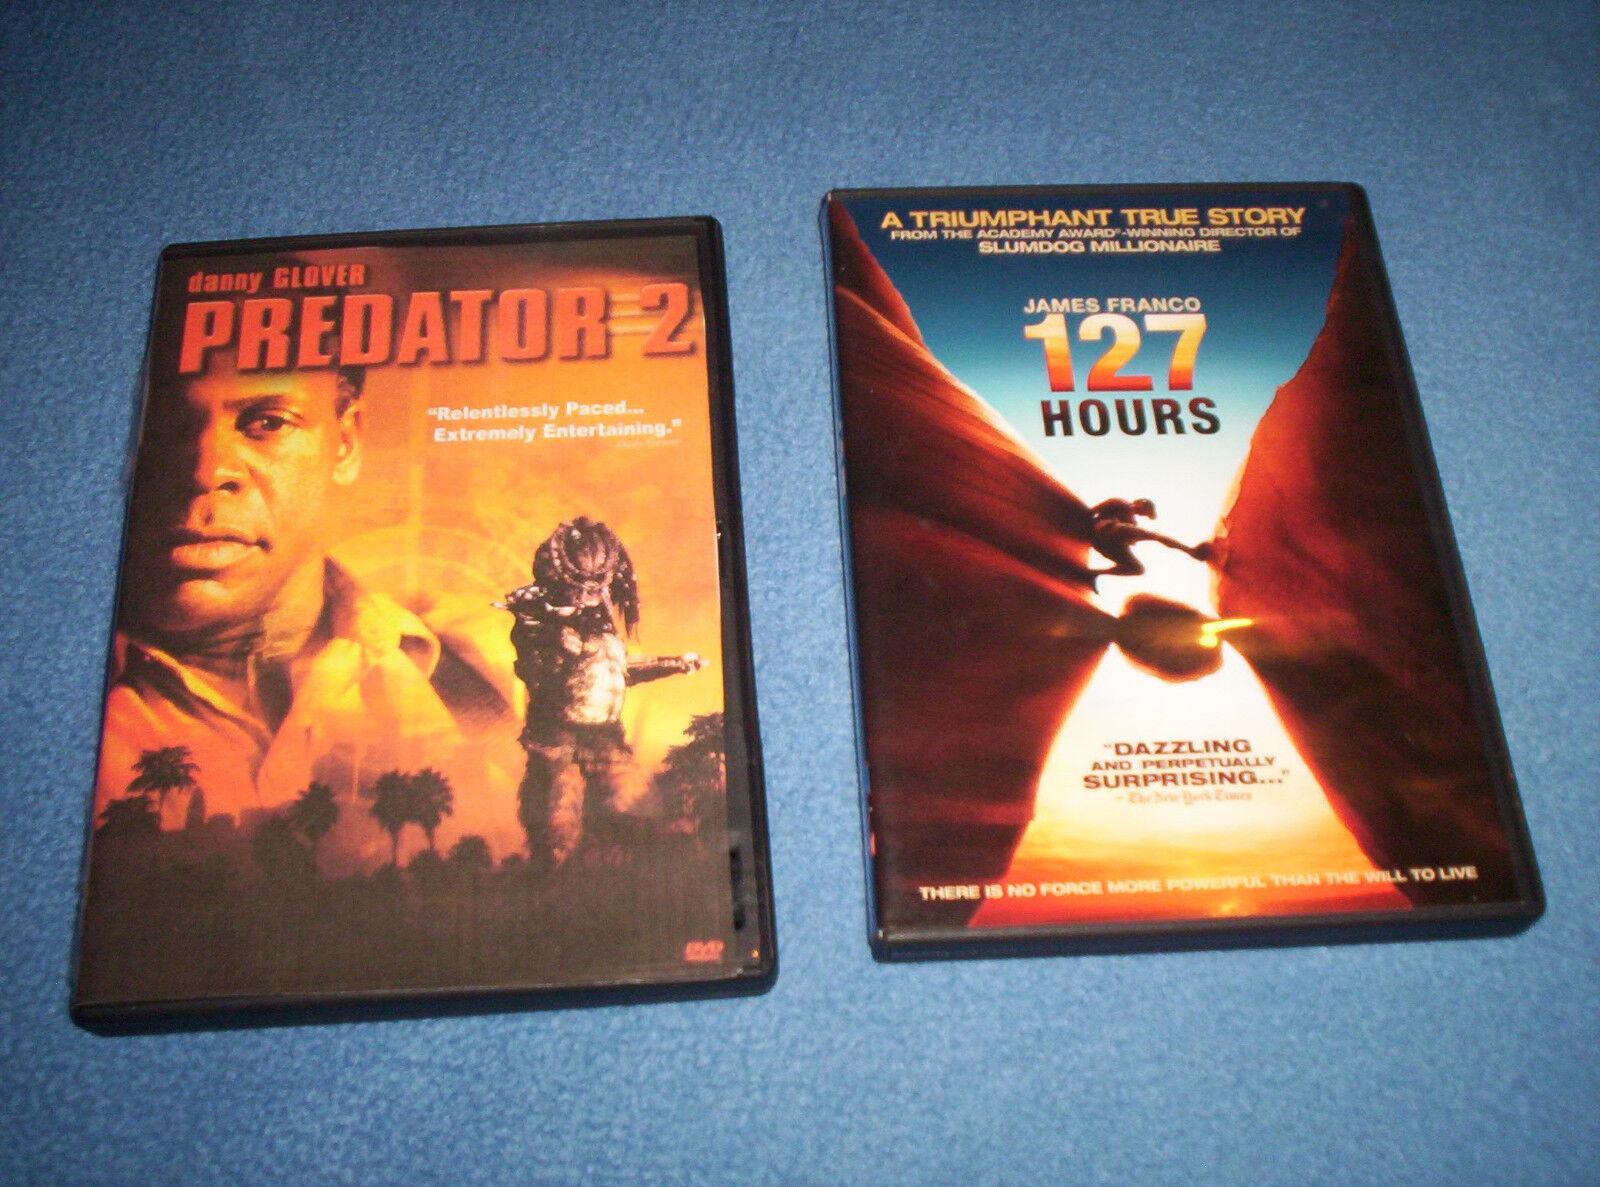 127 Hours Predator 2 DVD s - $5.00